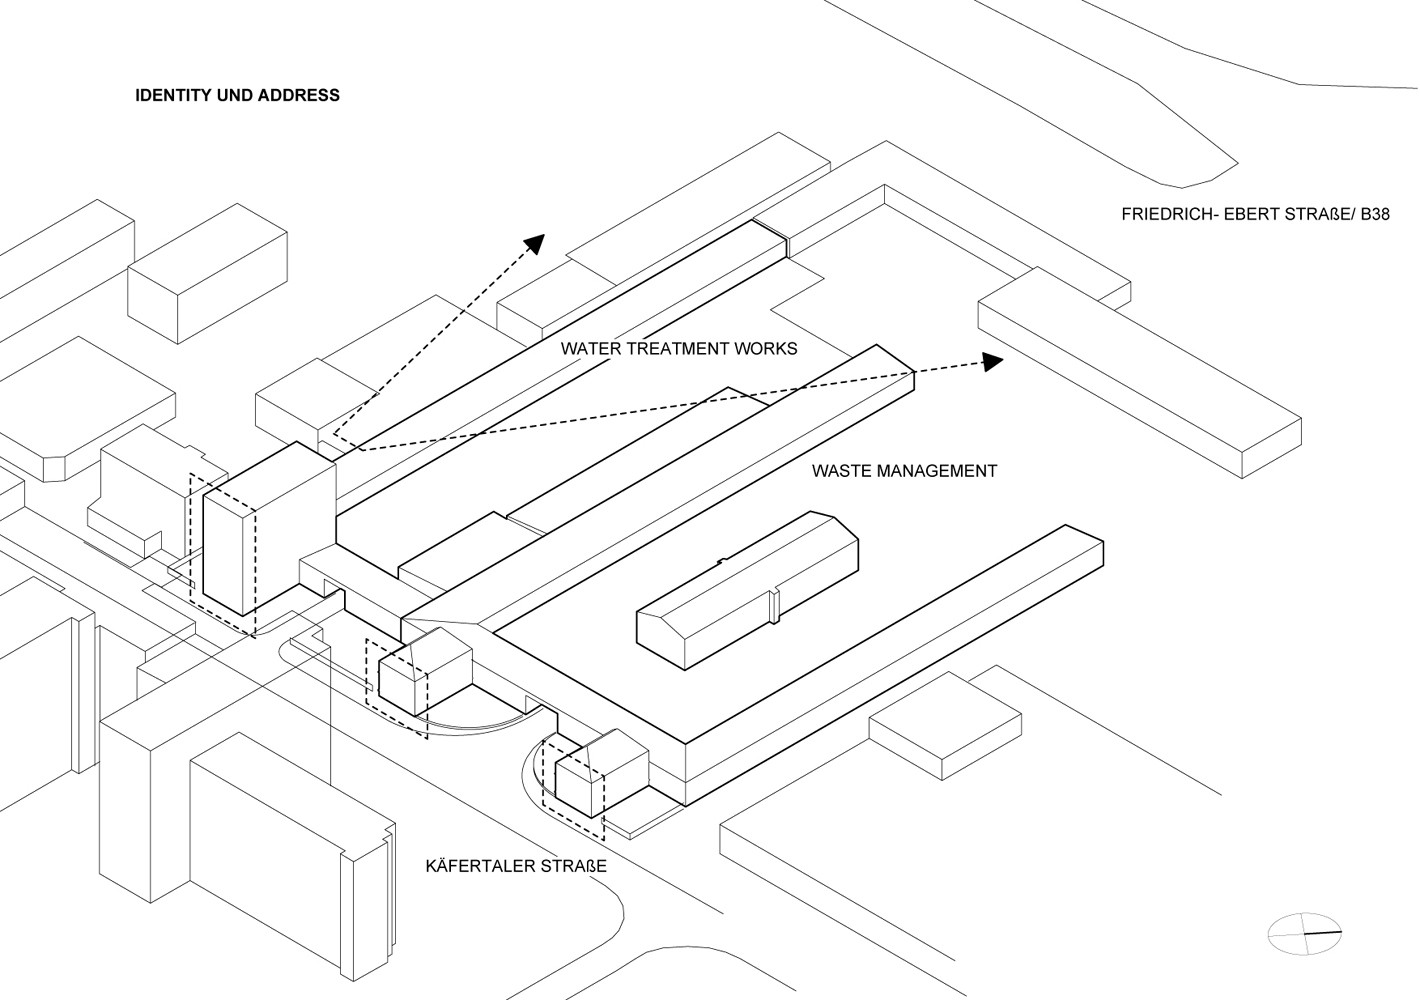 1990 mustang wiring diagram mannheim water treatment works motorplan architektur